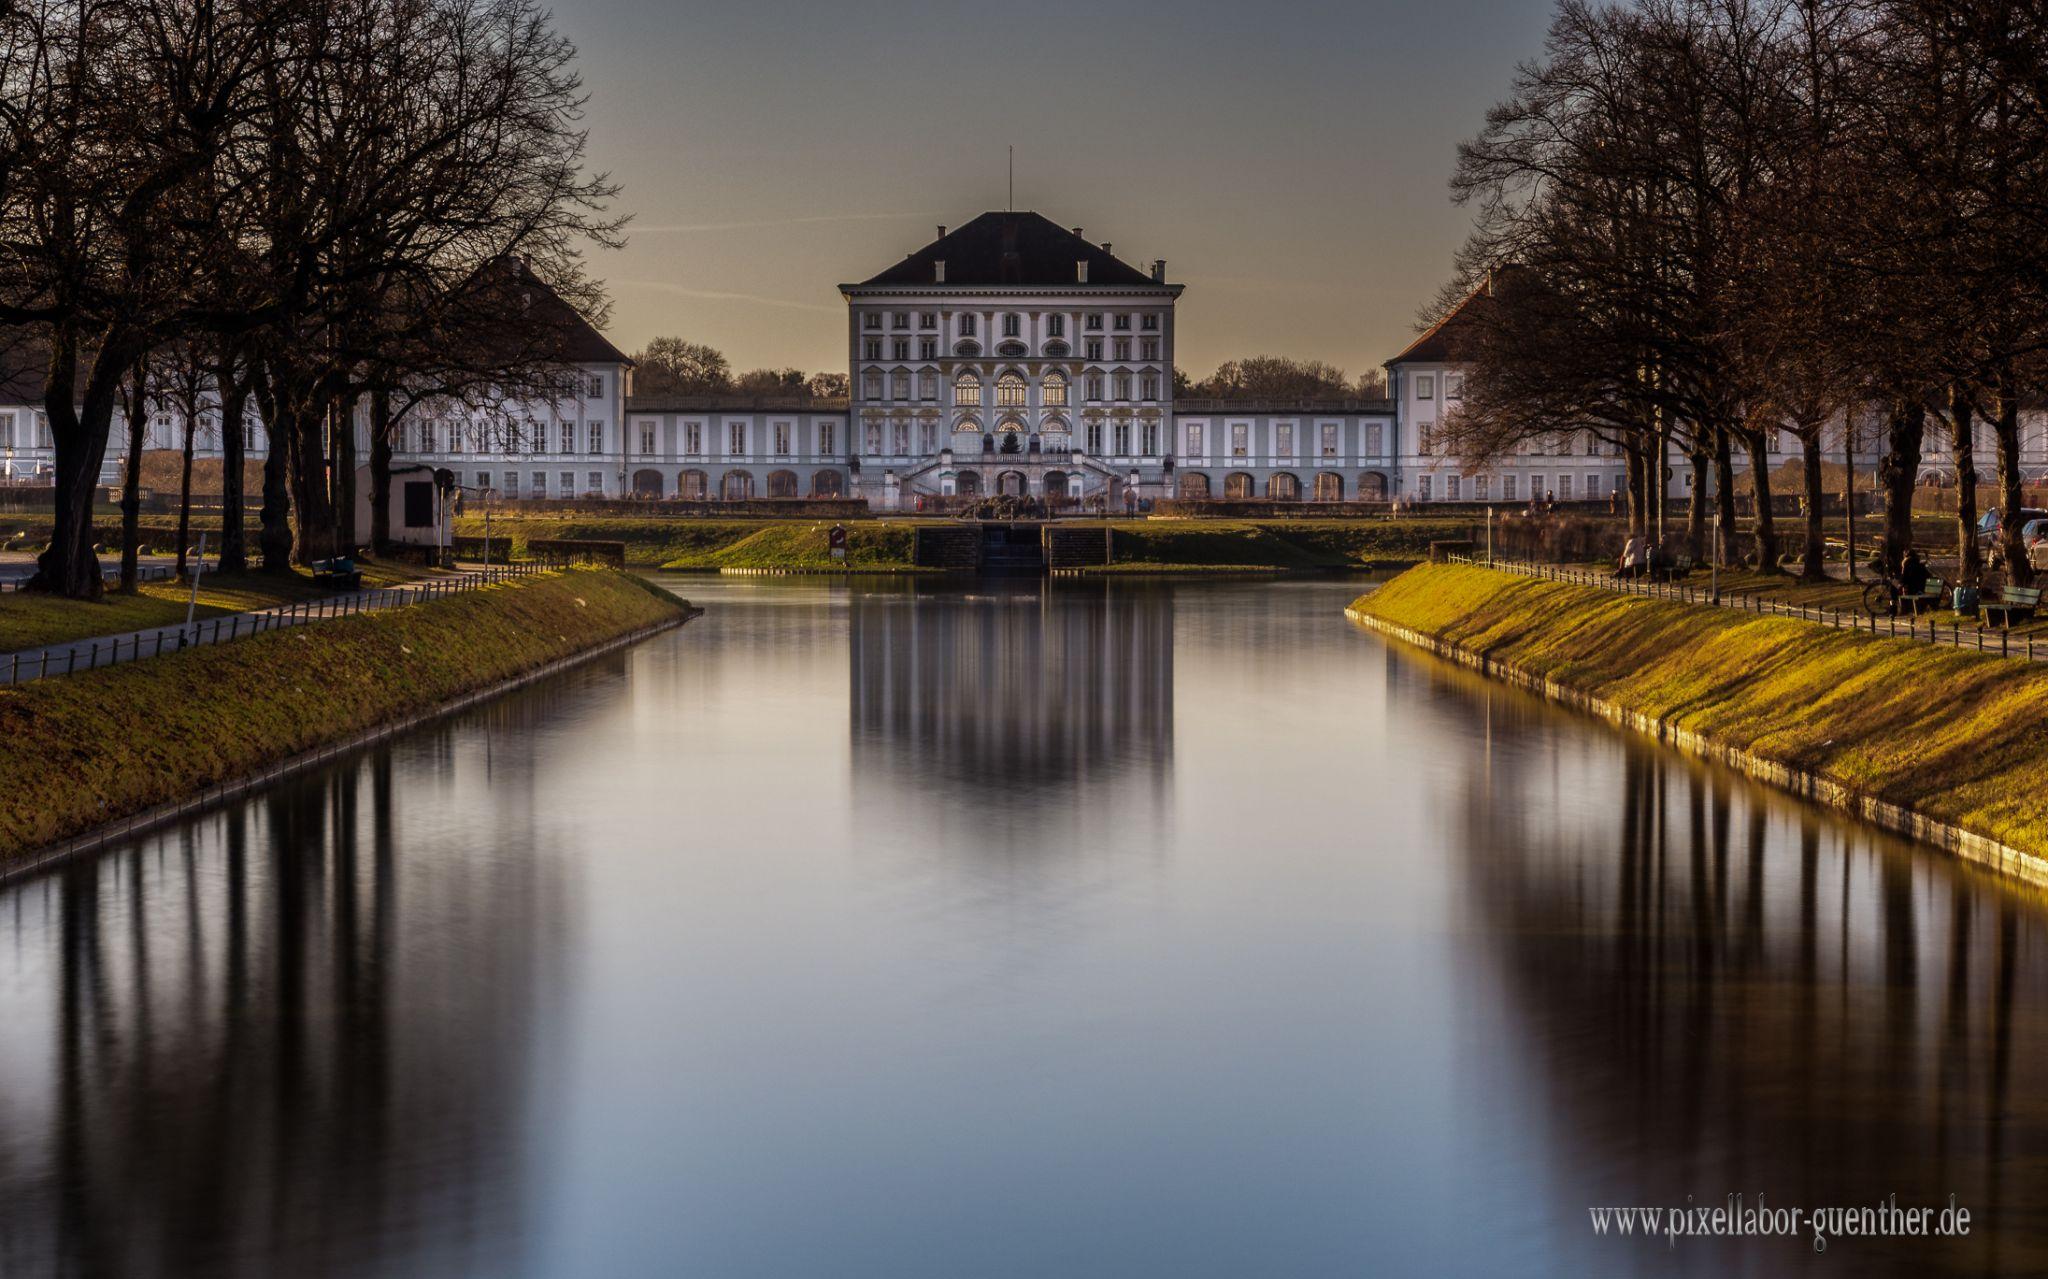 Castle Nymphenburg, Germany